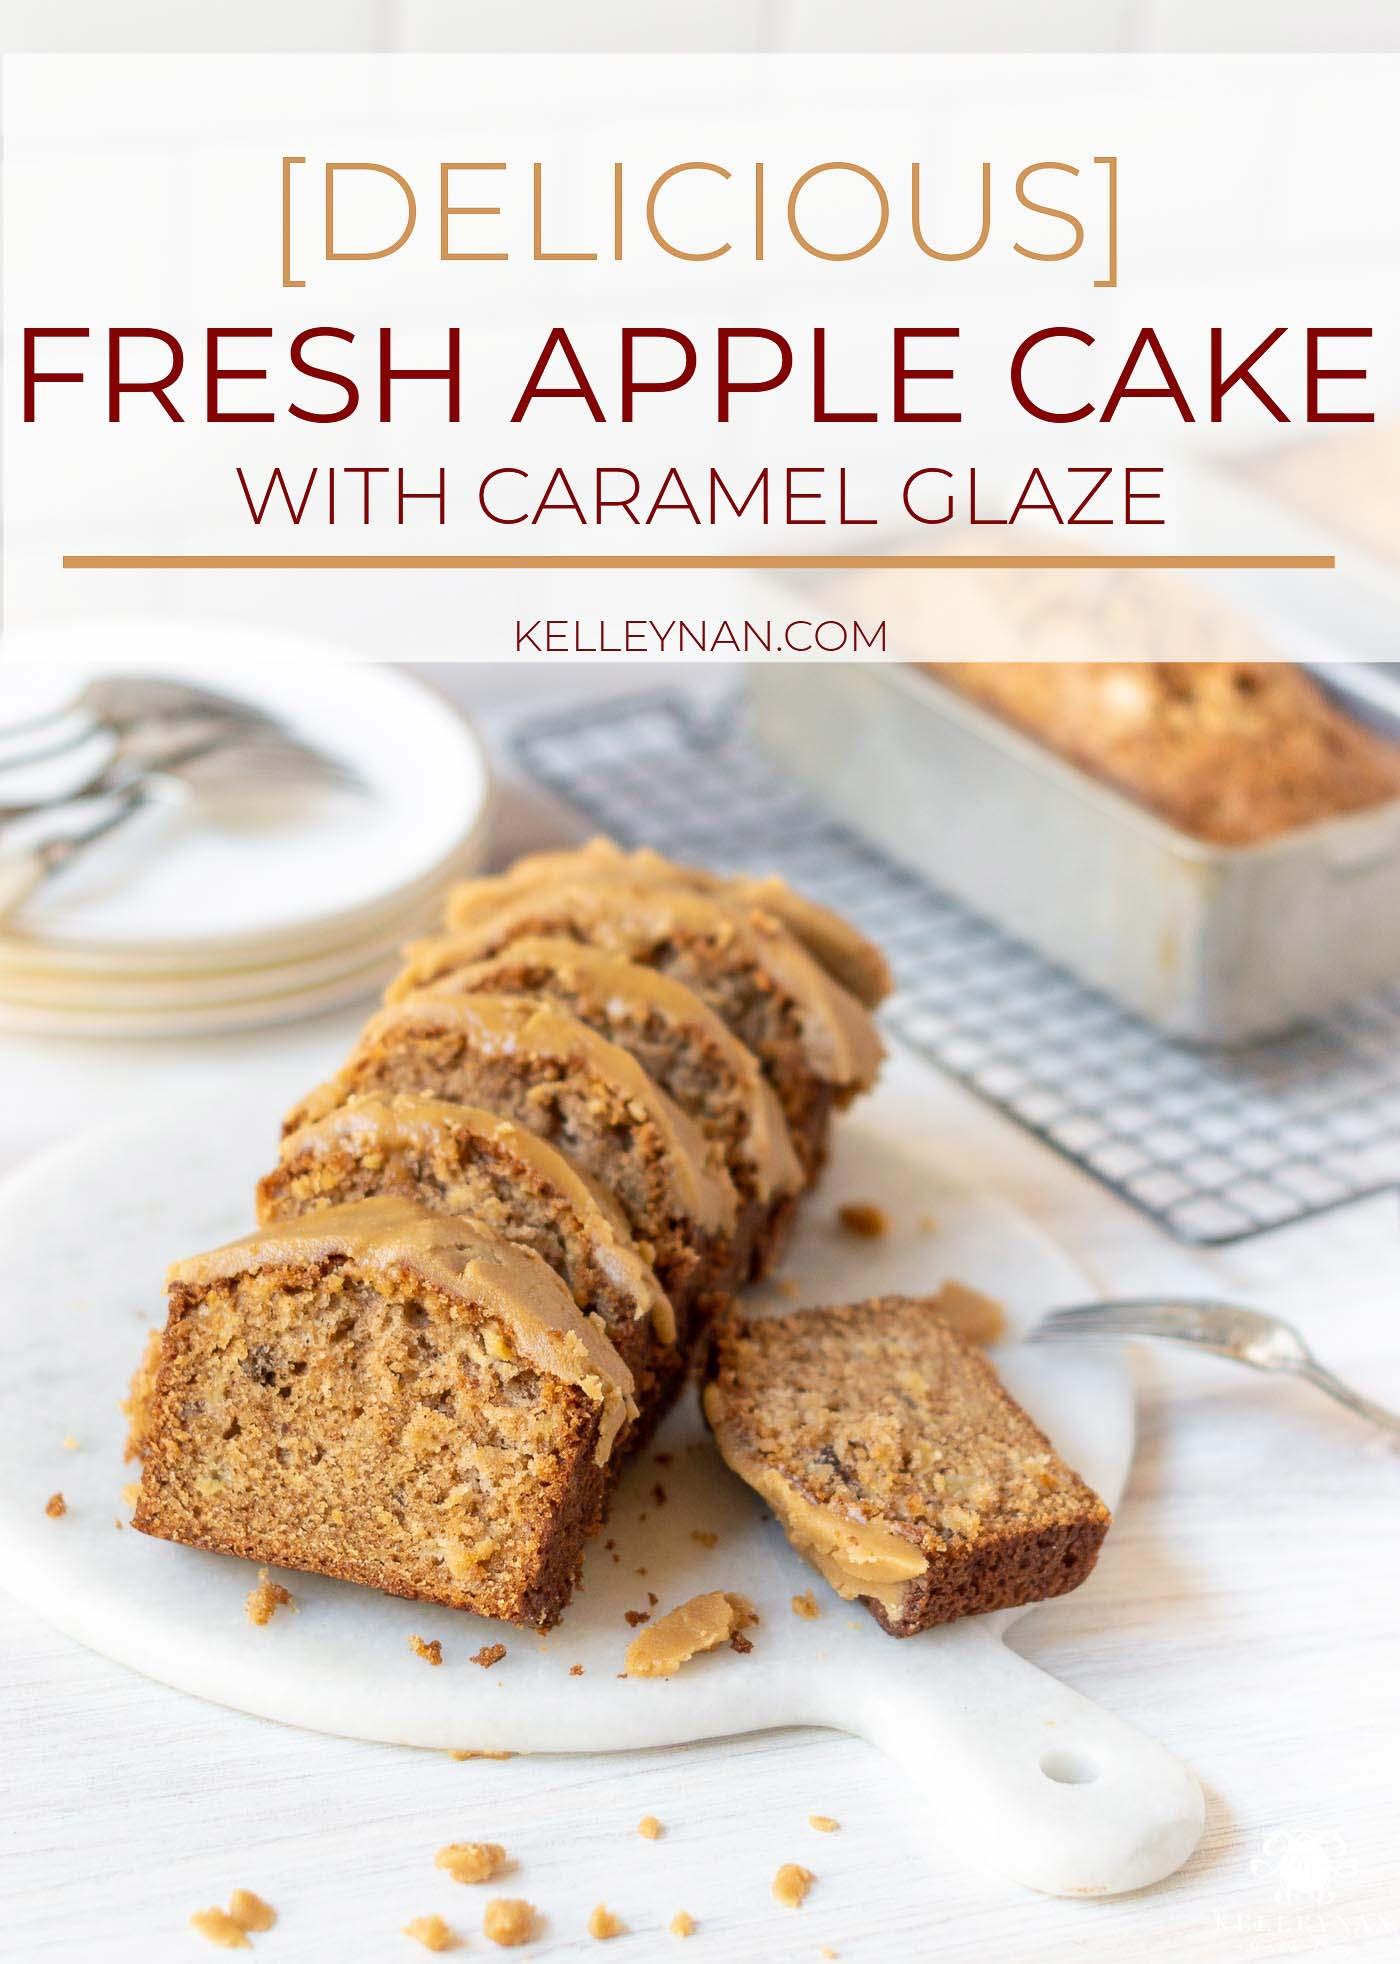 Fresh Apple Cake Recipe with Caramel Glaze